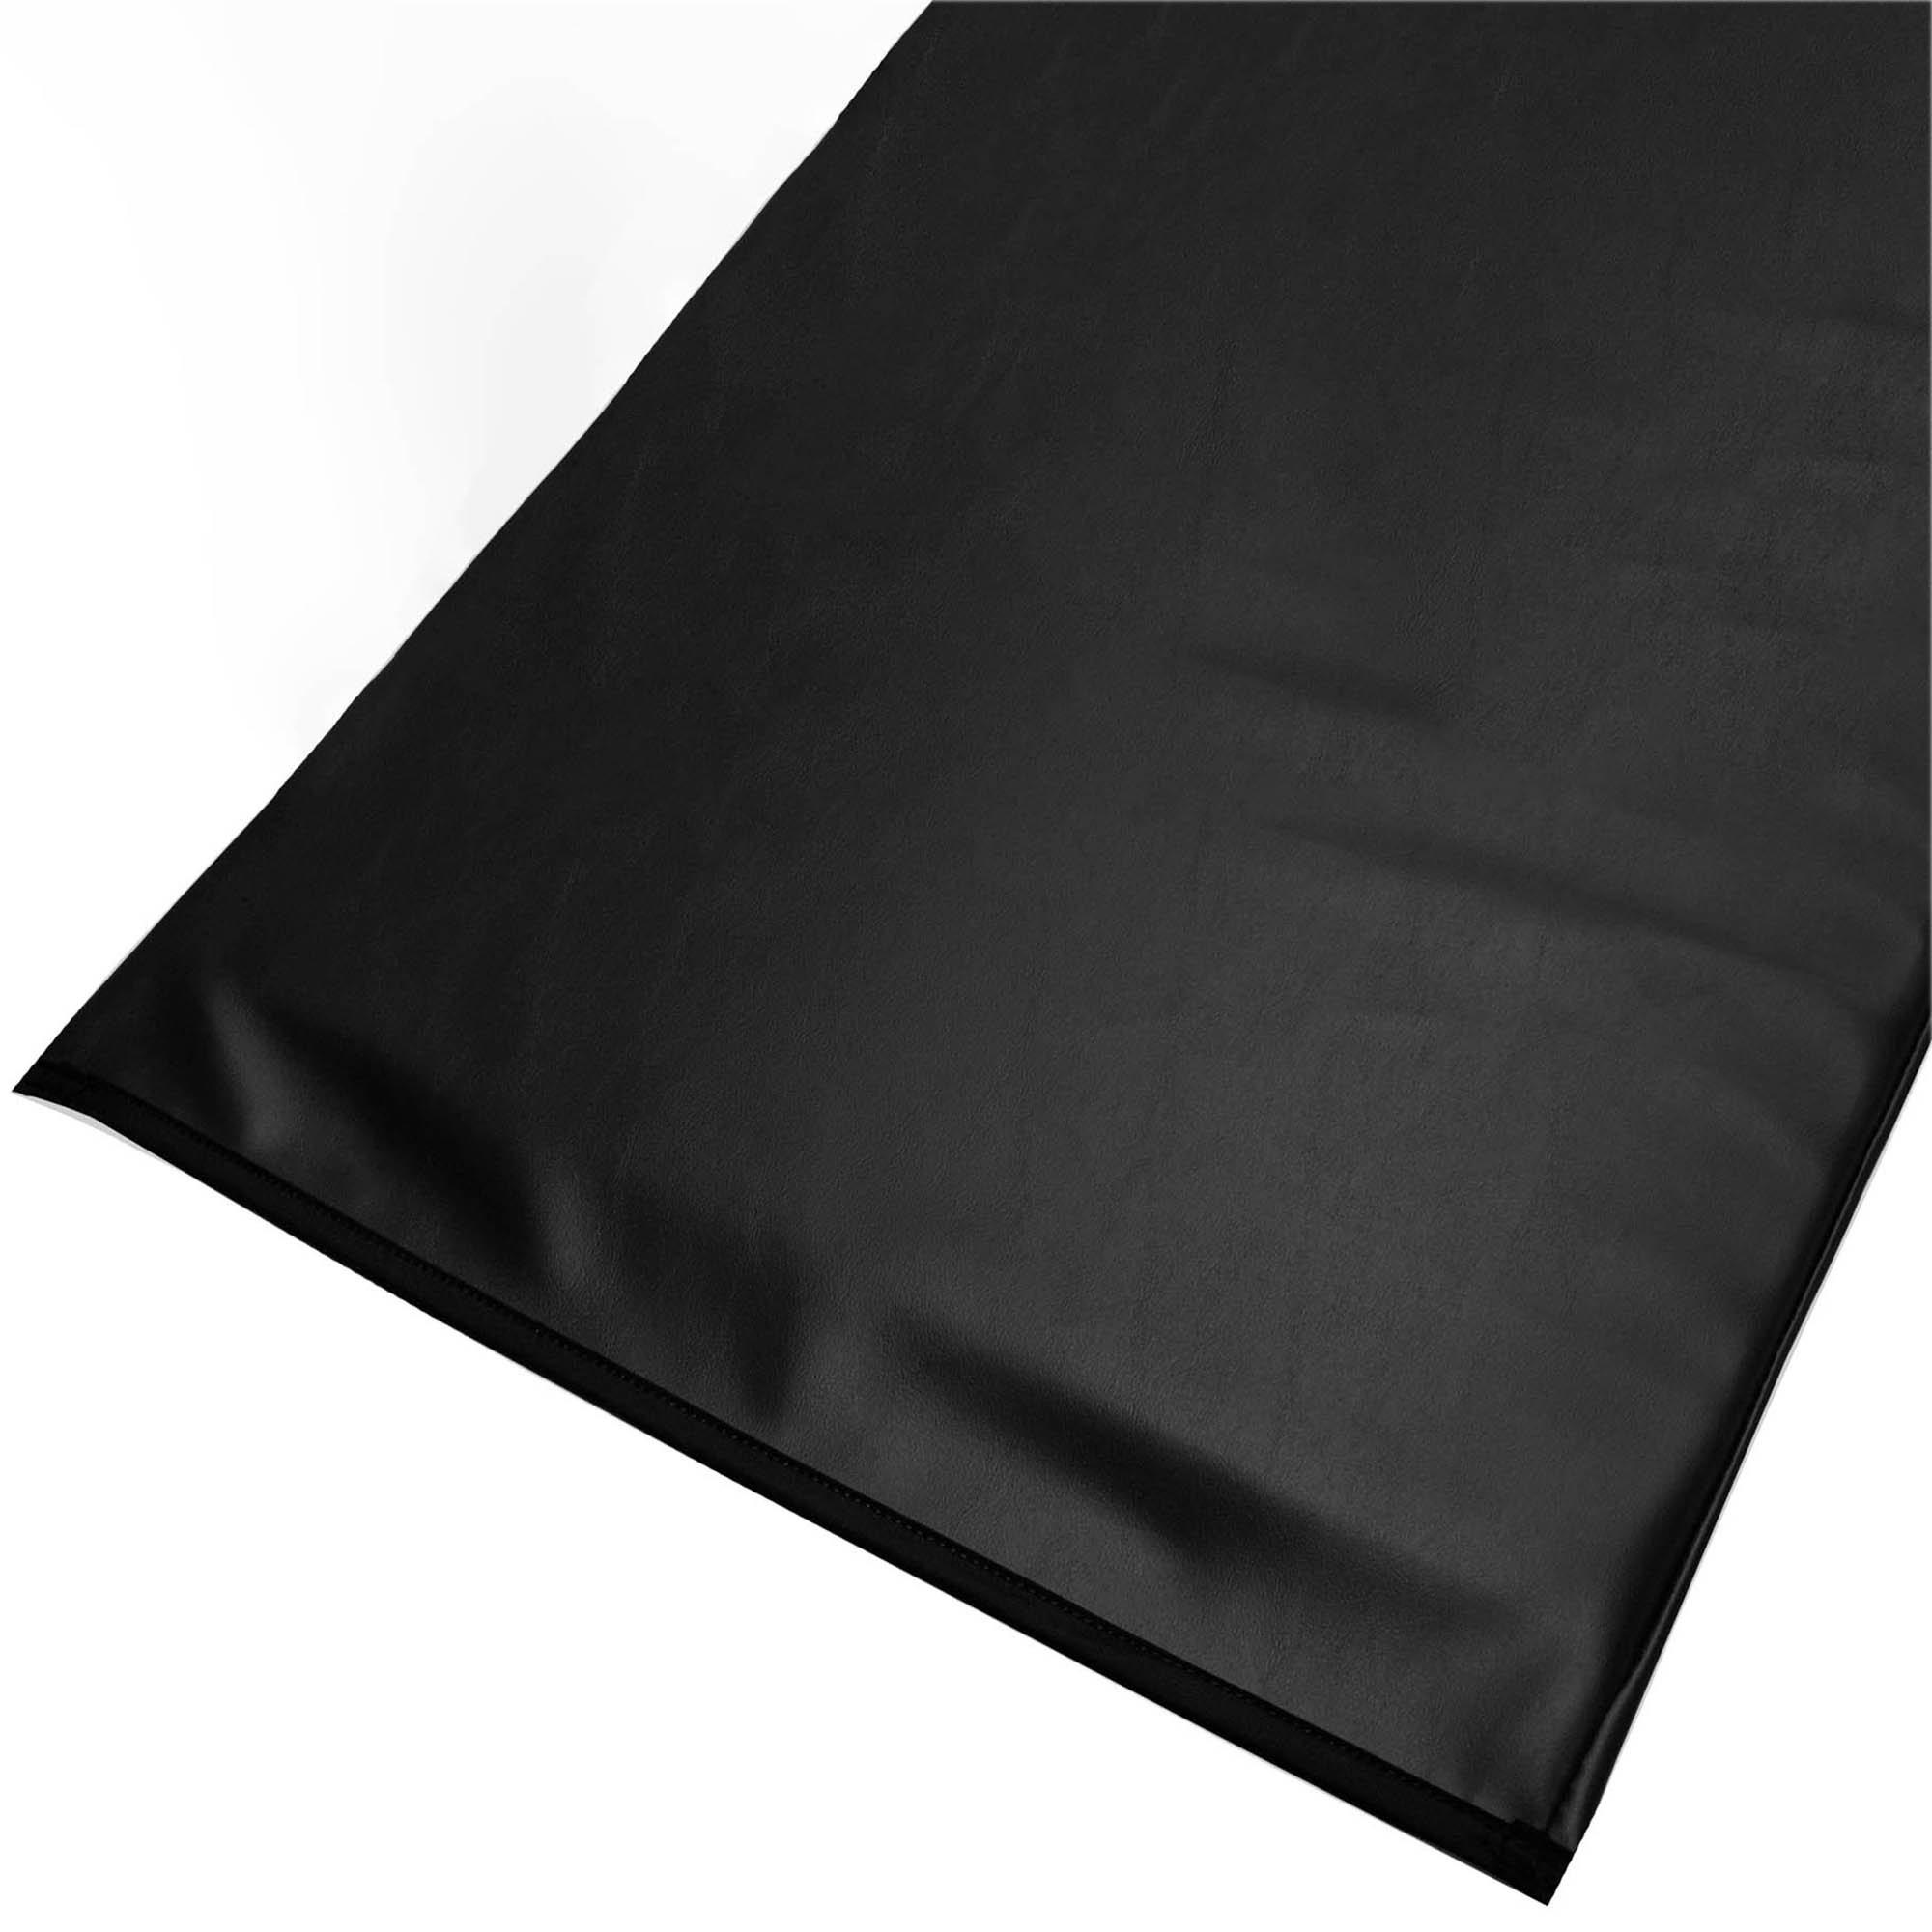 Standard Radiolucent X-Ray Comfort Foam Table Pad - Black Vinyl, No Grommets 72